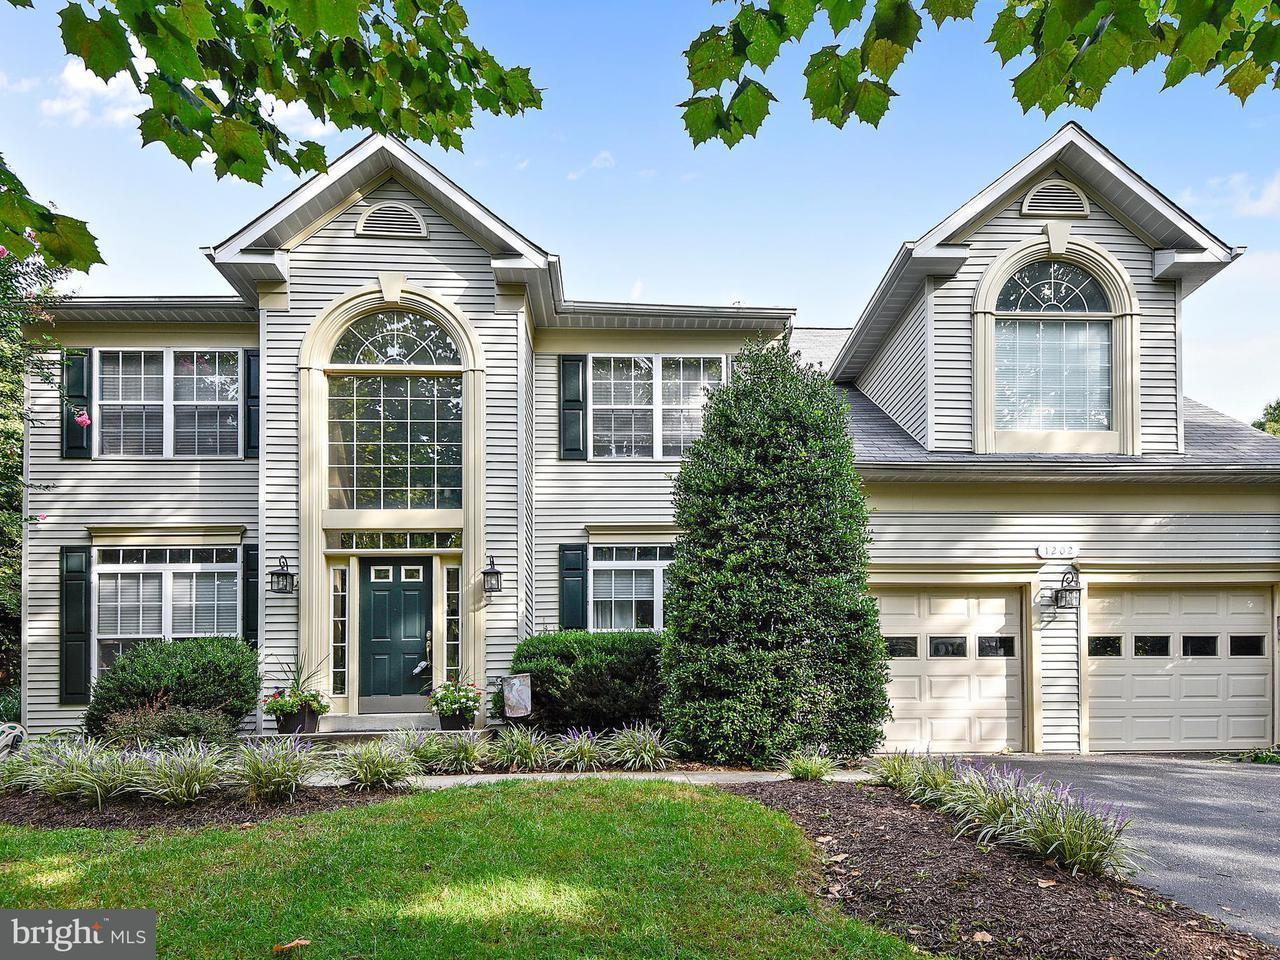 Single Family Home for Sale at 1202 Breckenridge Court 1202 Breckenridge Court Riva, Maryland 21140 United States